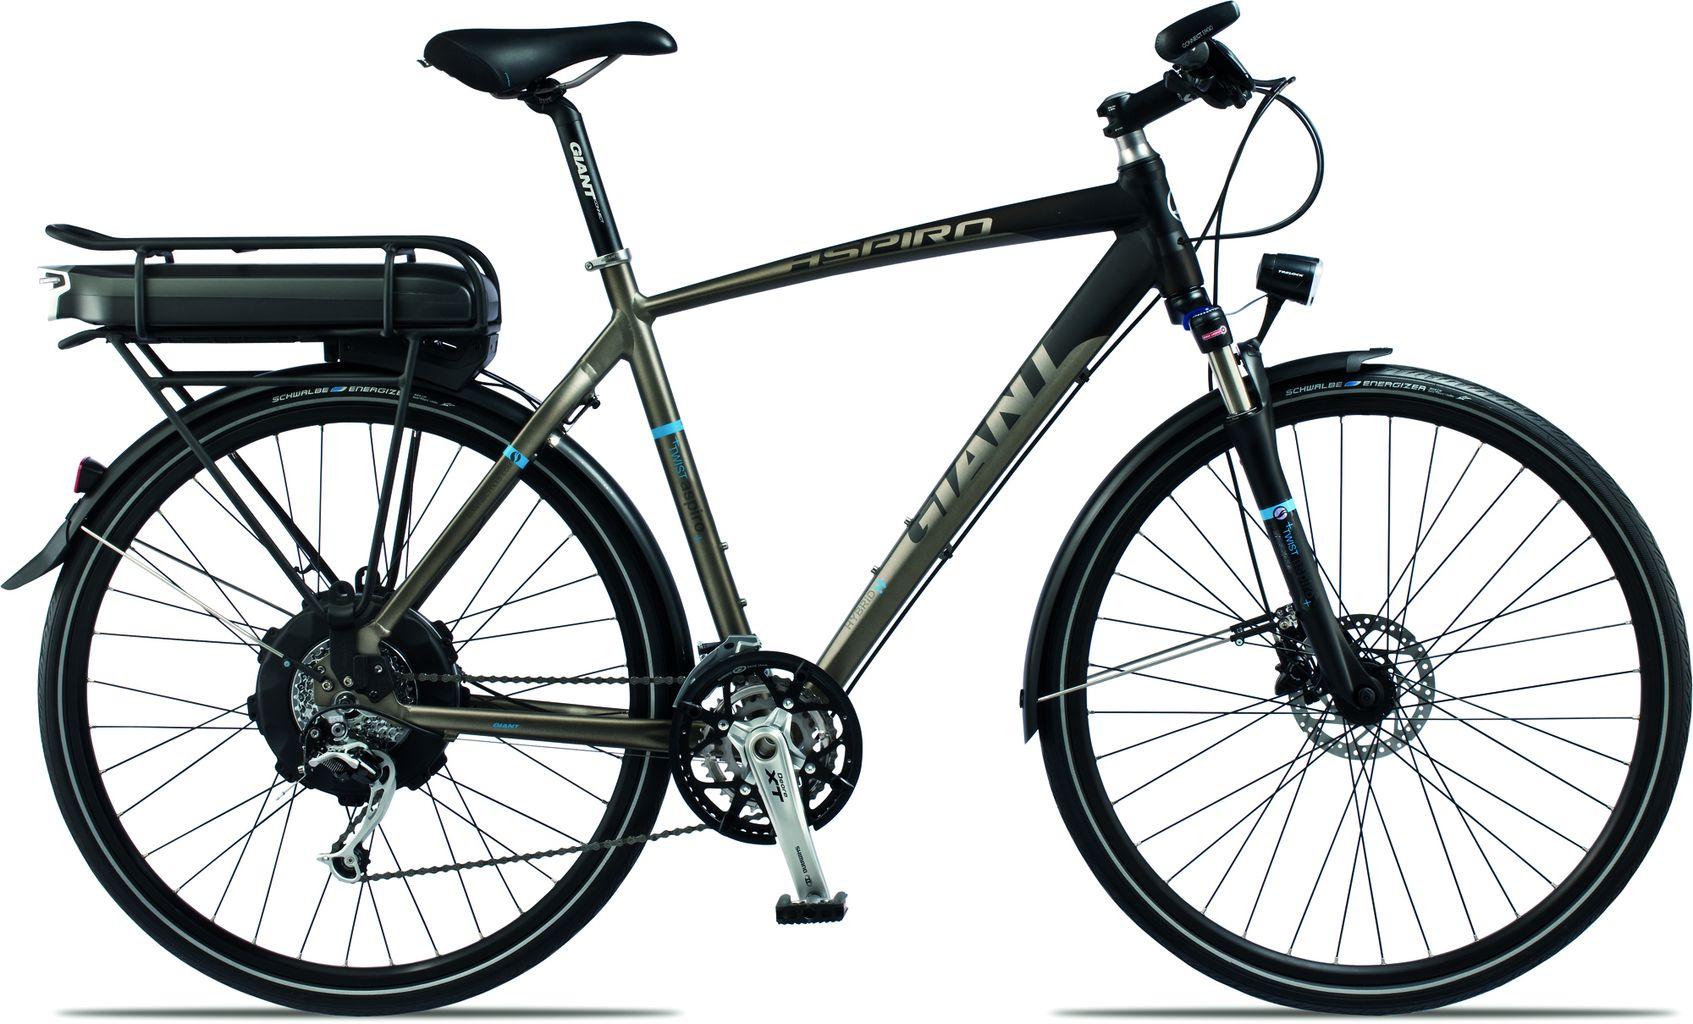 neuheit 2013 von giant mit 29 zoll e bike talon 29 hybrid. Black Bedroom Furniture Sets. Home Design Ideas